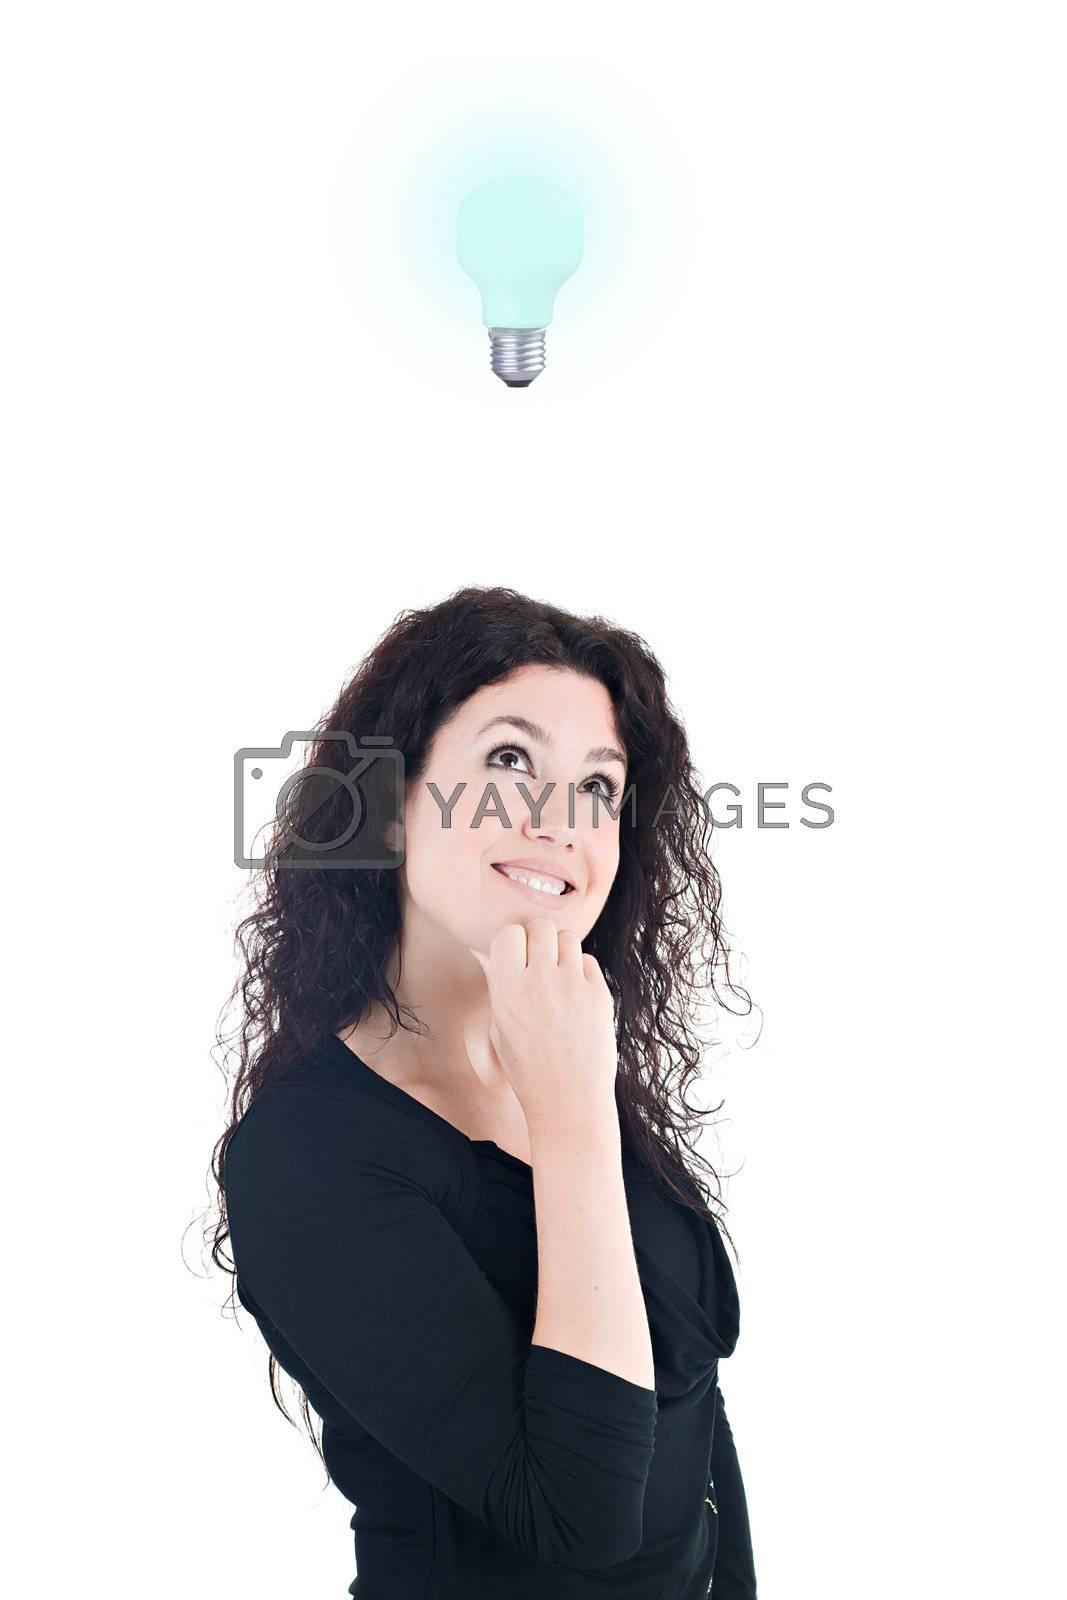 Royalty free image of Bright Idea by ajn